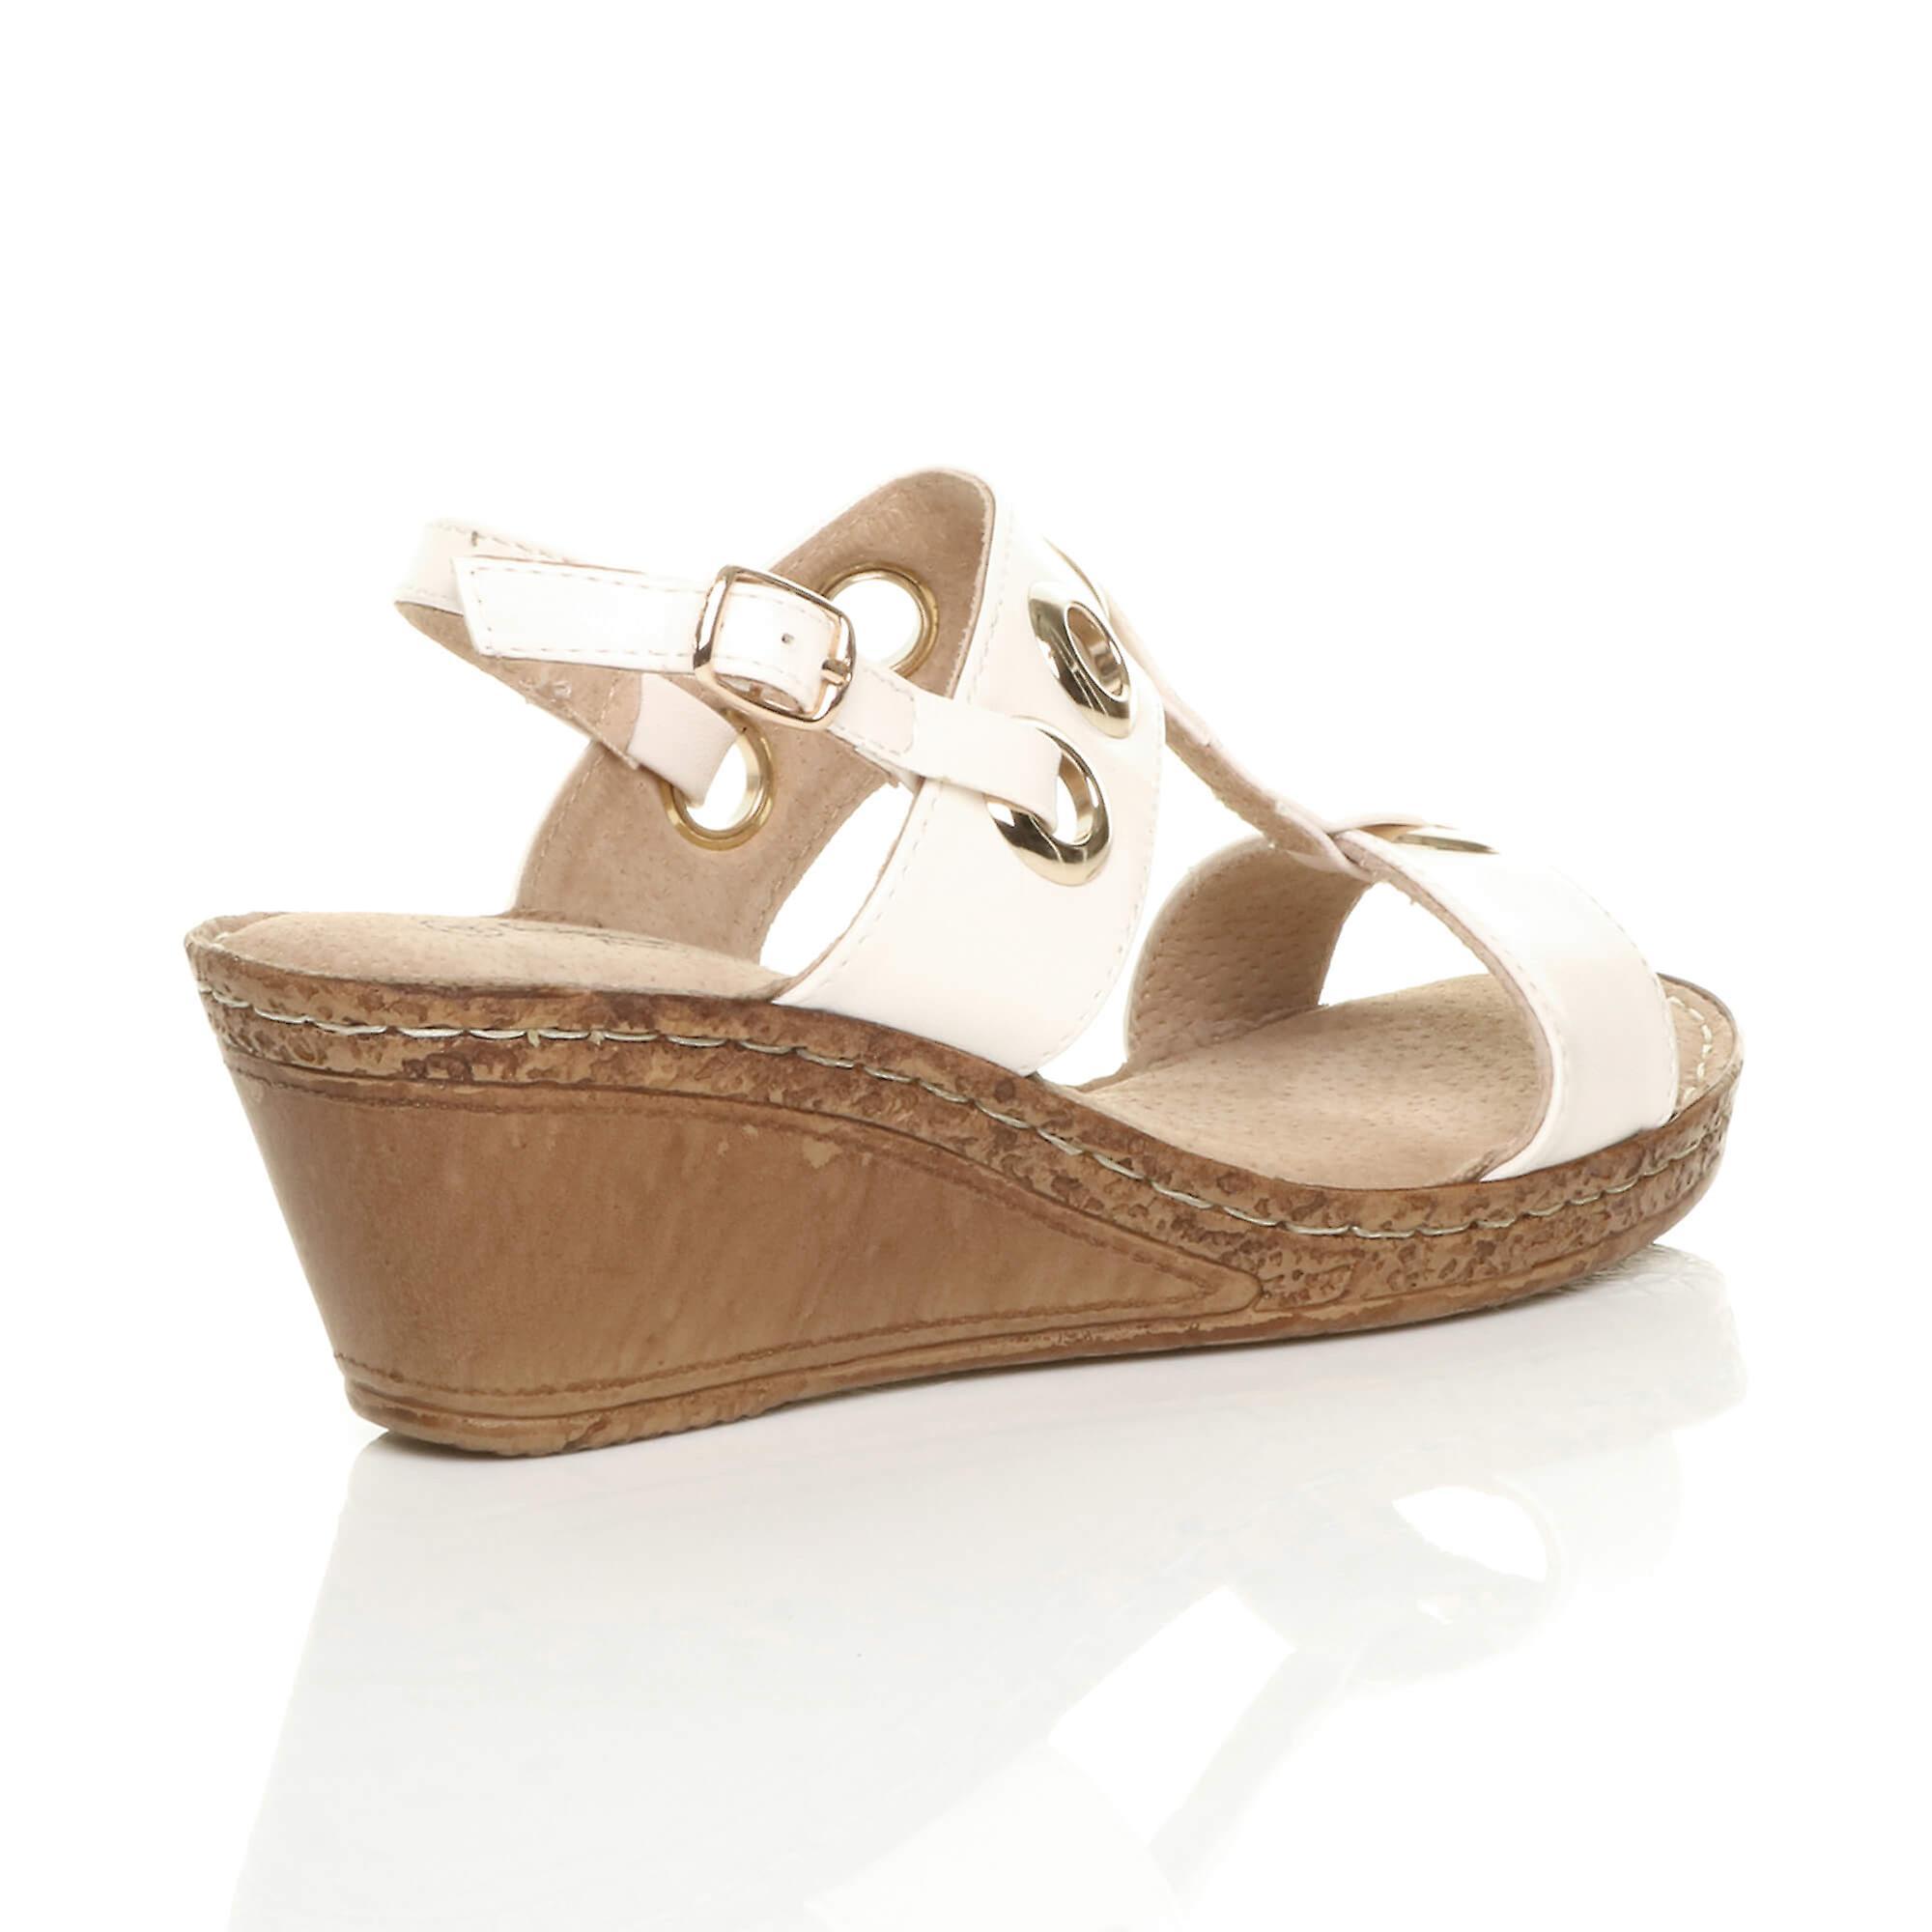 platform womens bar heel wedge sandals Ajvani slingback comfort mid t 4A0xqwUq